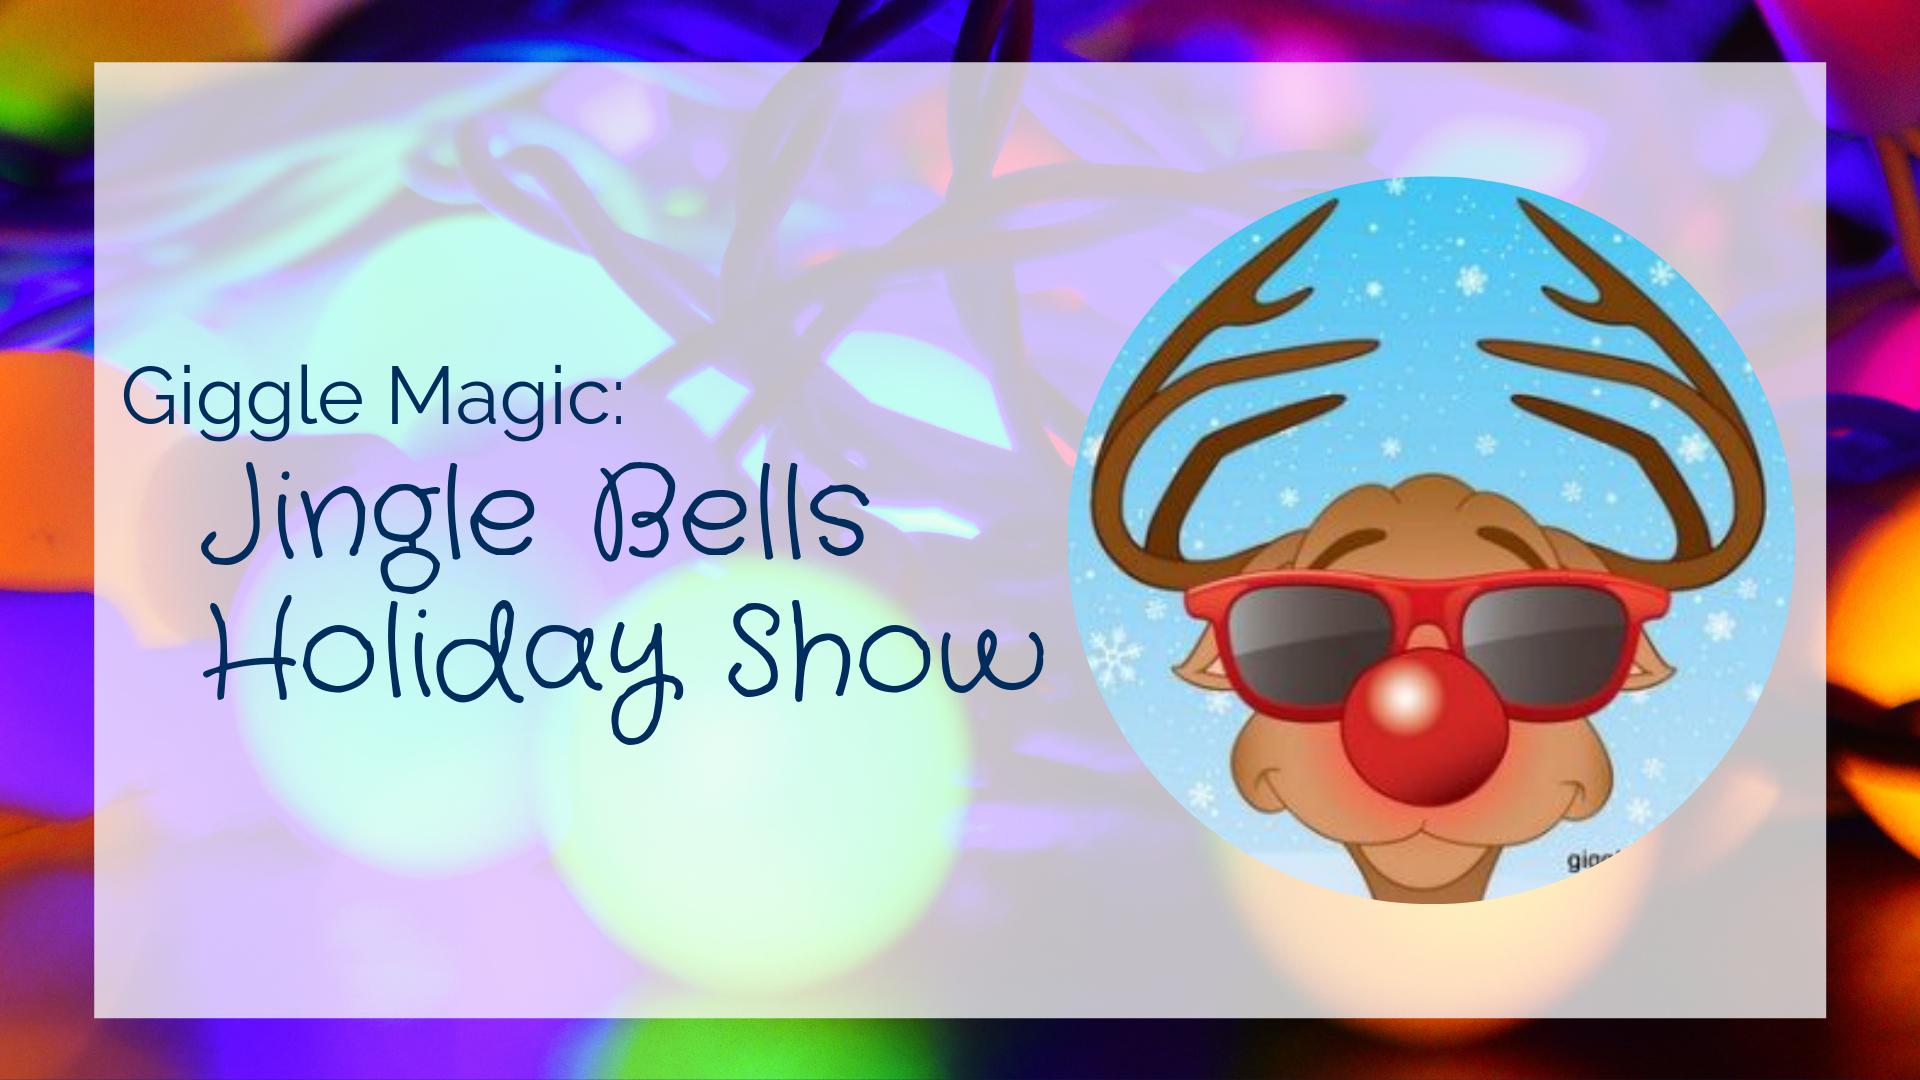 Giggle Magic: Jingle Bells Holiday Show